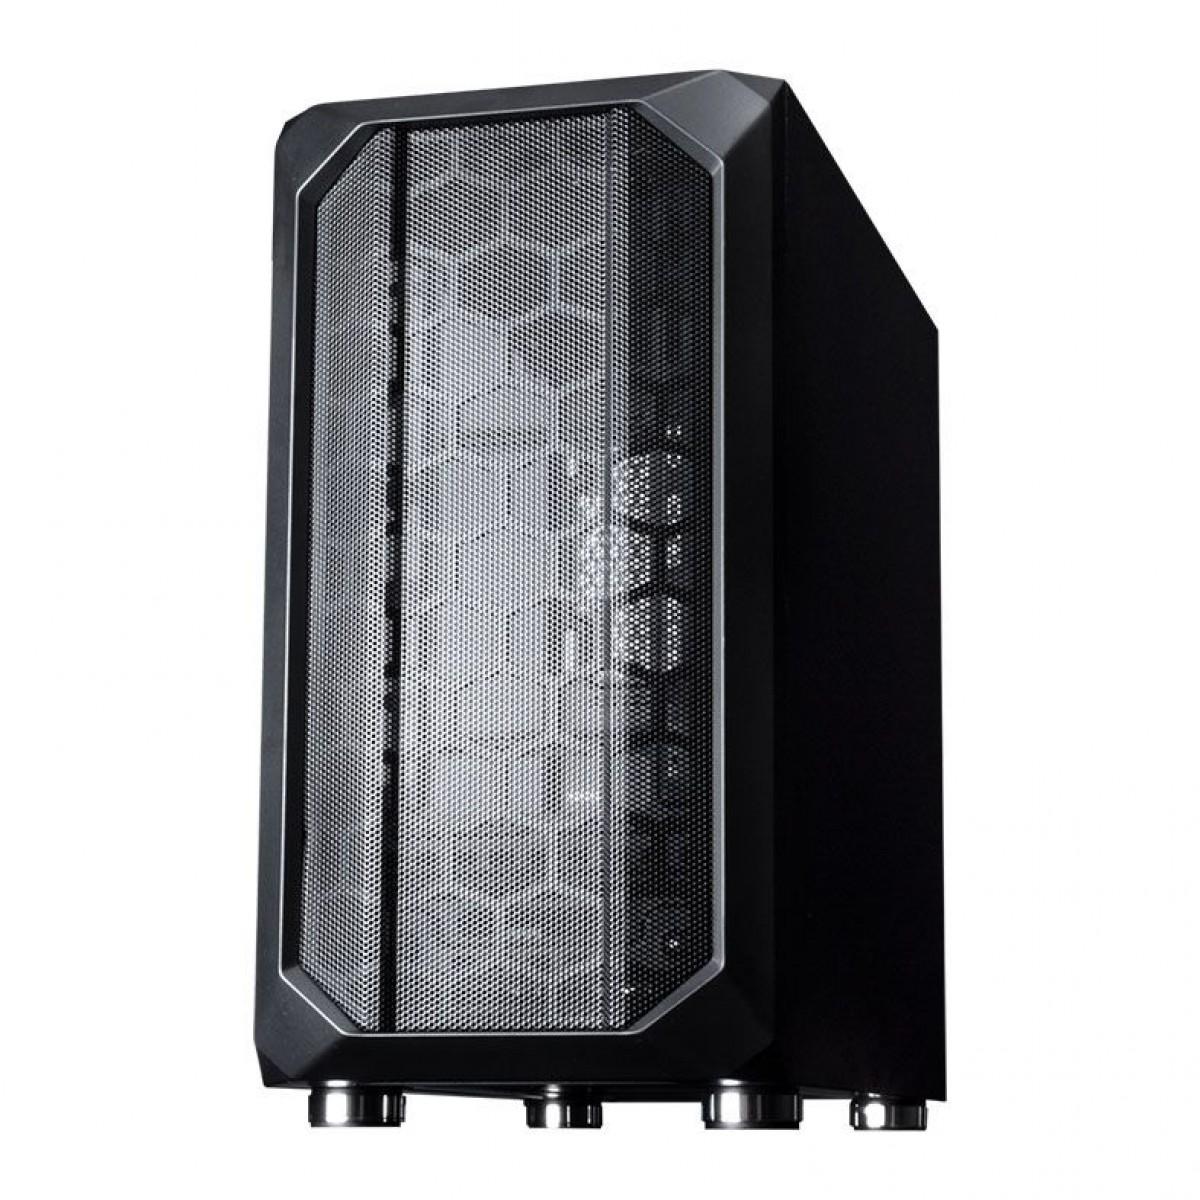 Gabinete Gamer Galax Nebulosa, Mid Tower, Vidro Temperado, Sem Fan, Black, Sem Fonte, GX700